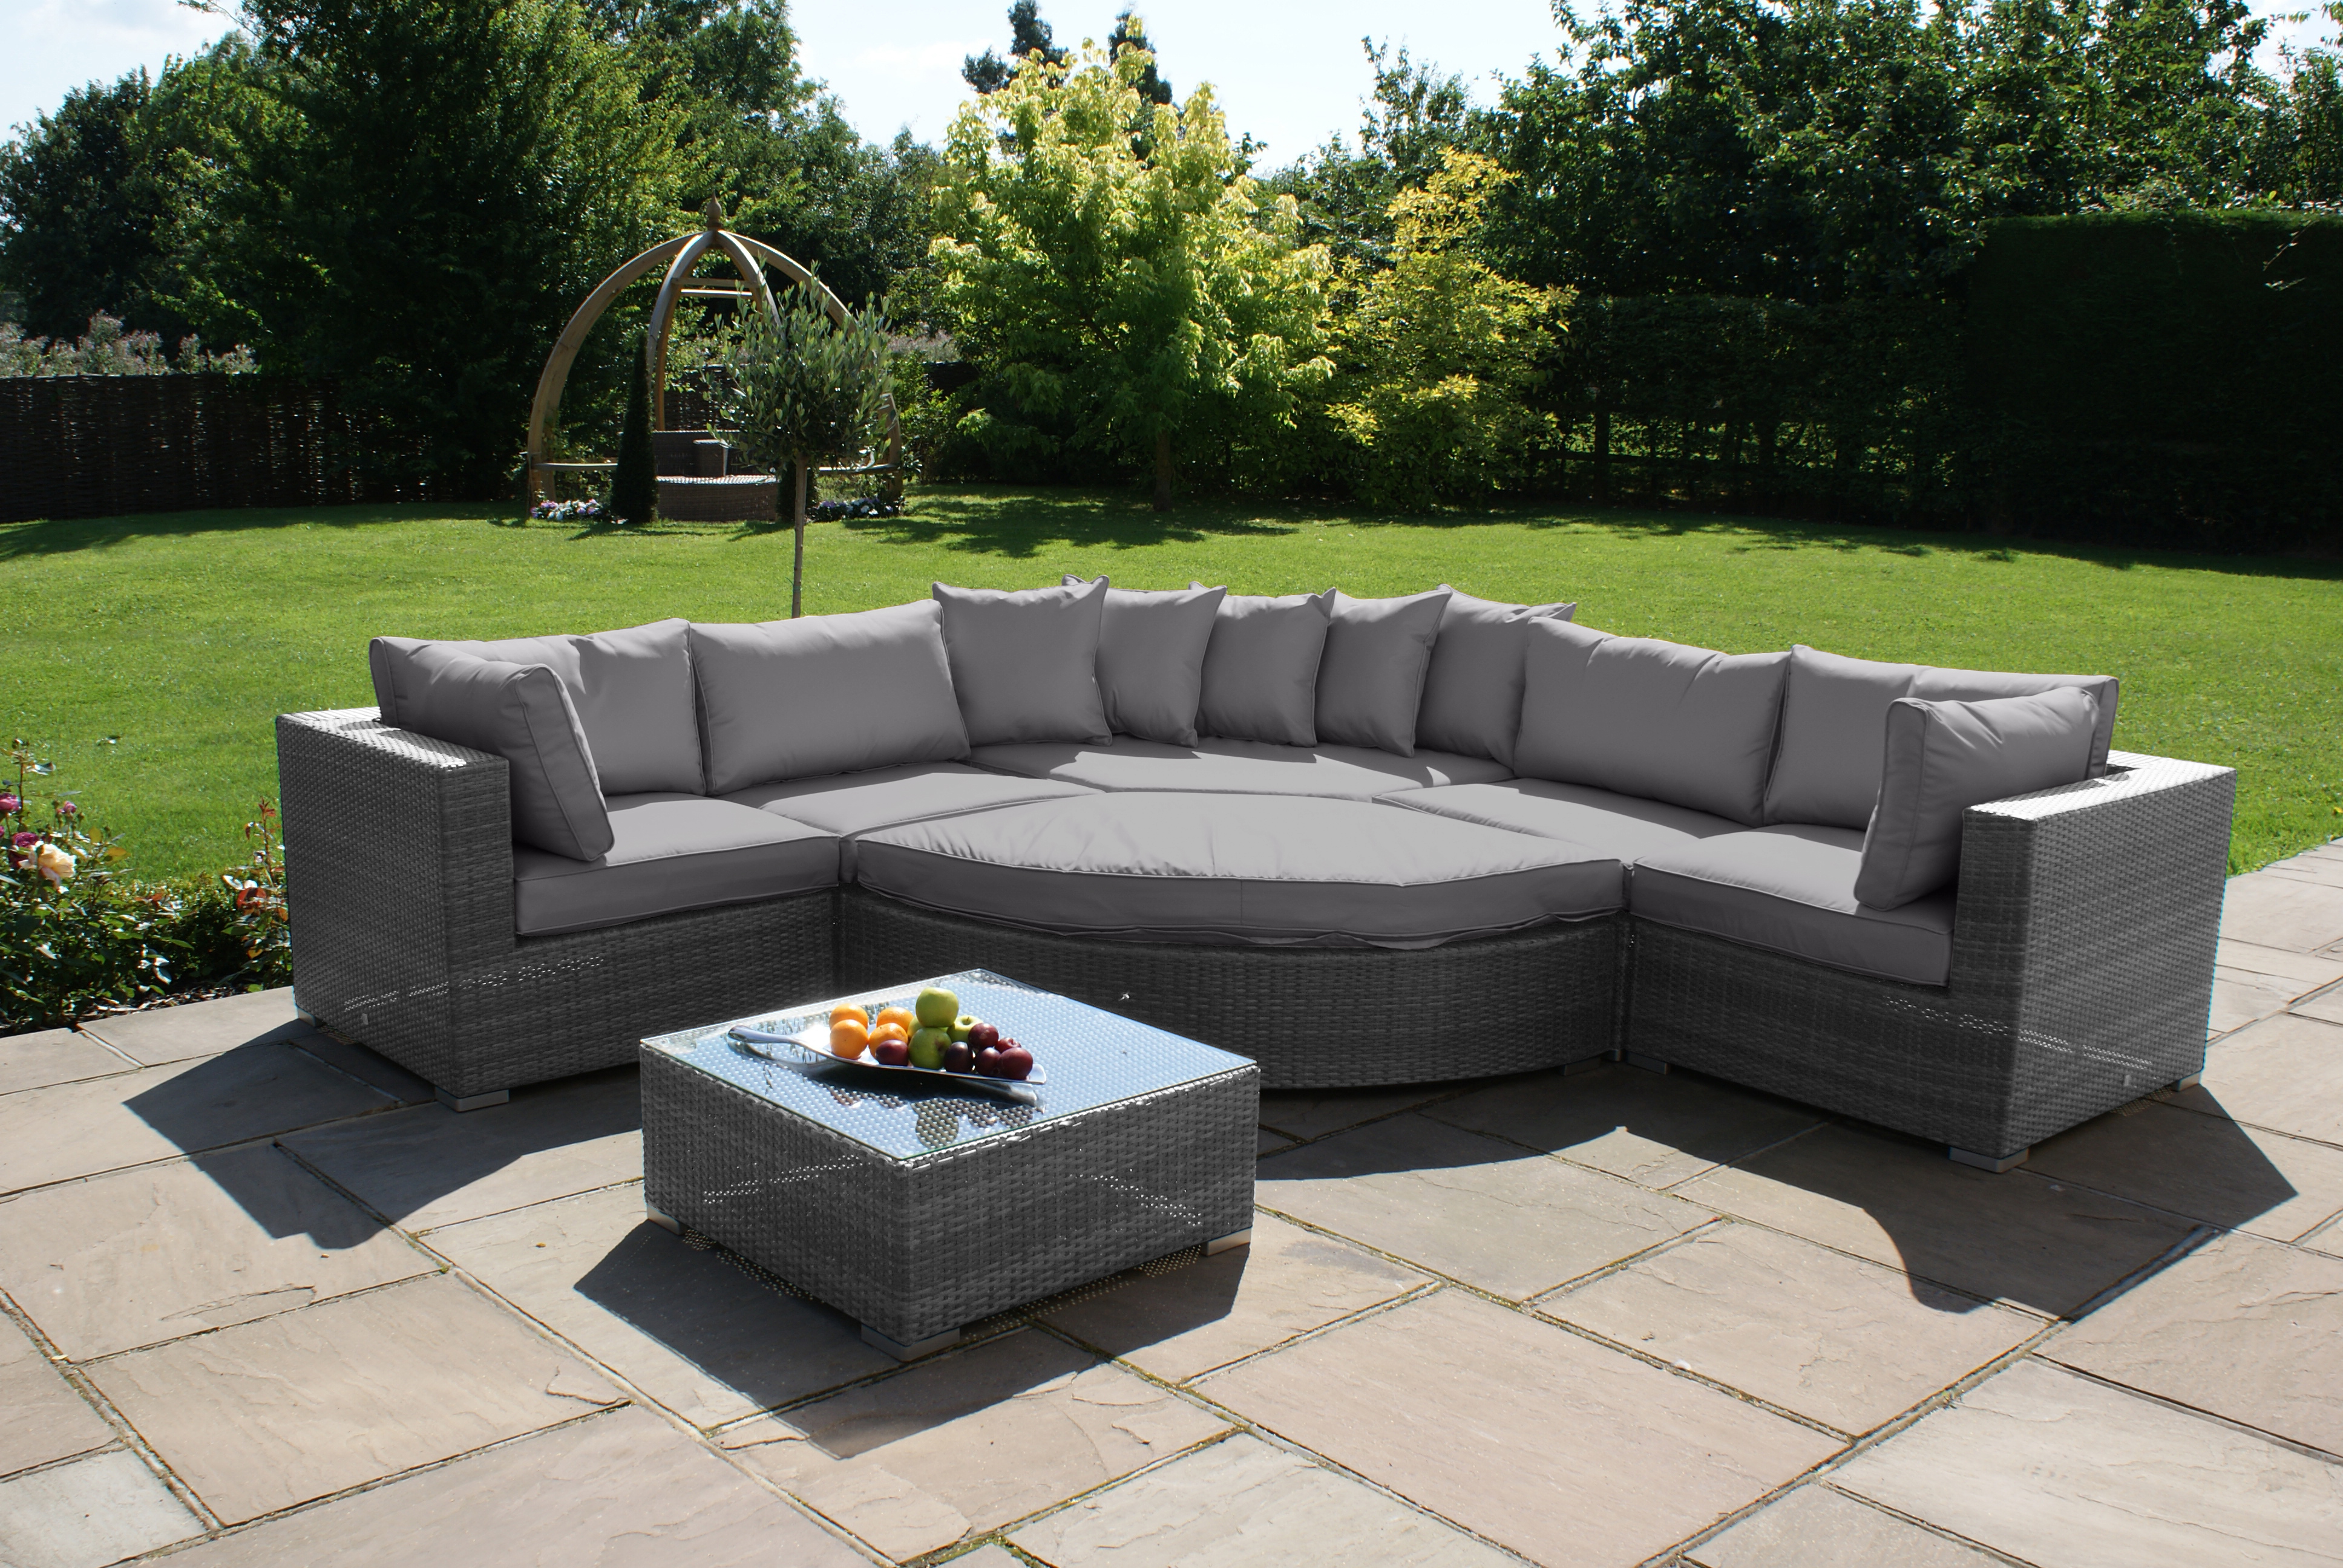 barcelona deluxe rattan corner sofa set crownhill. Black Bedroom Furniture Sets. Home Design Ideas